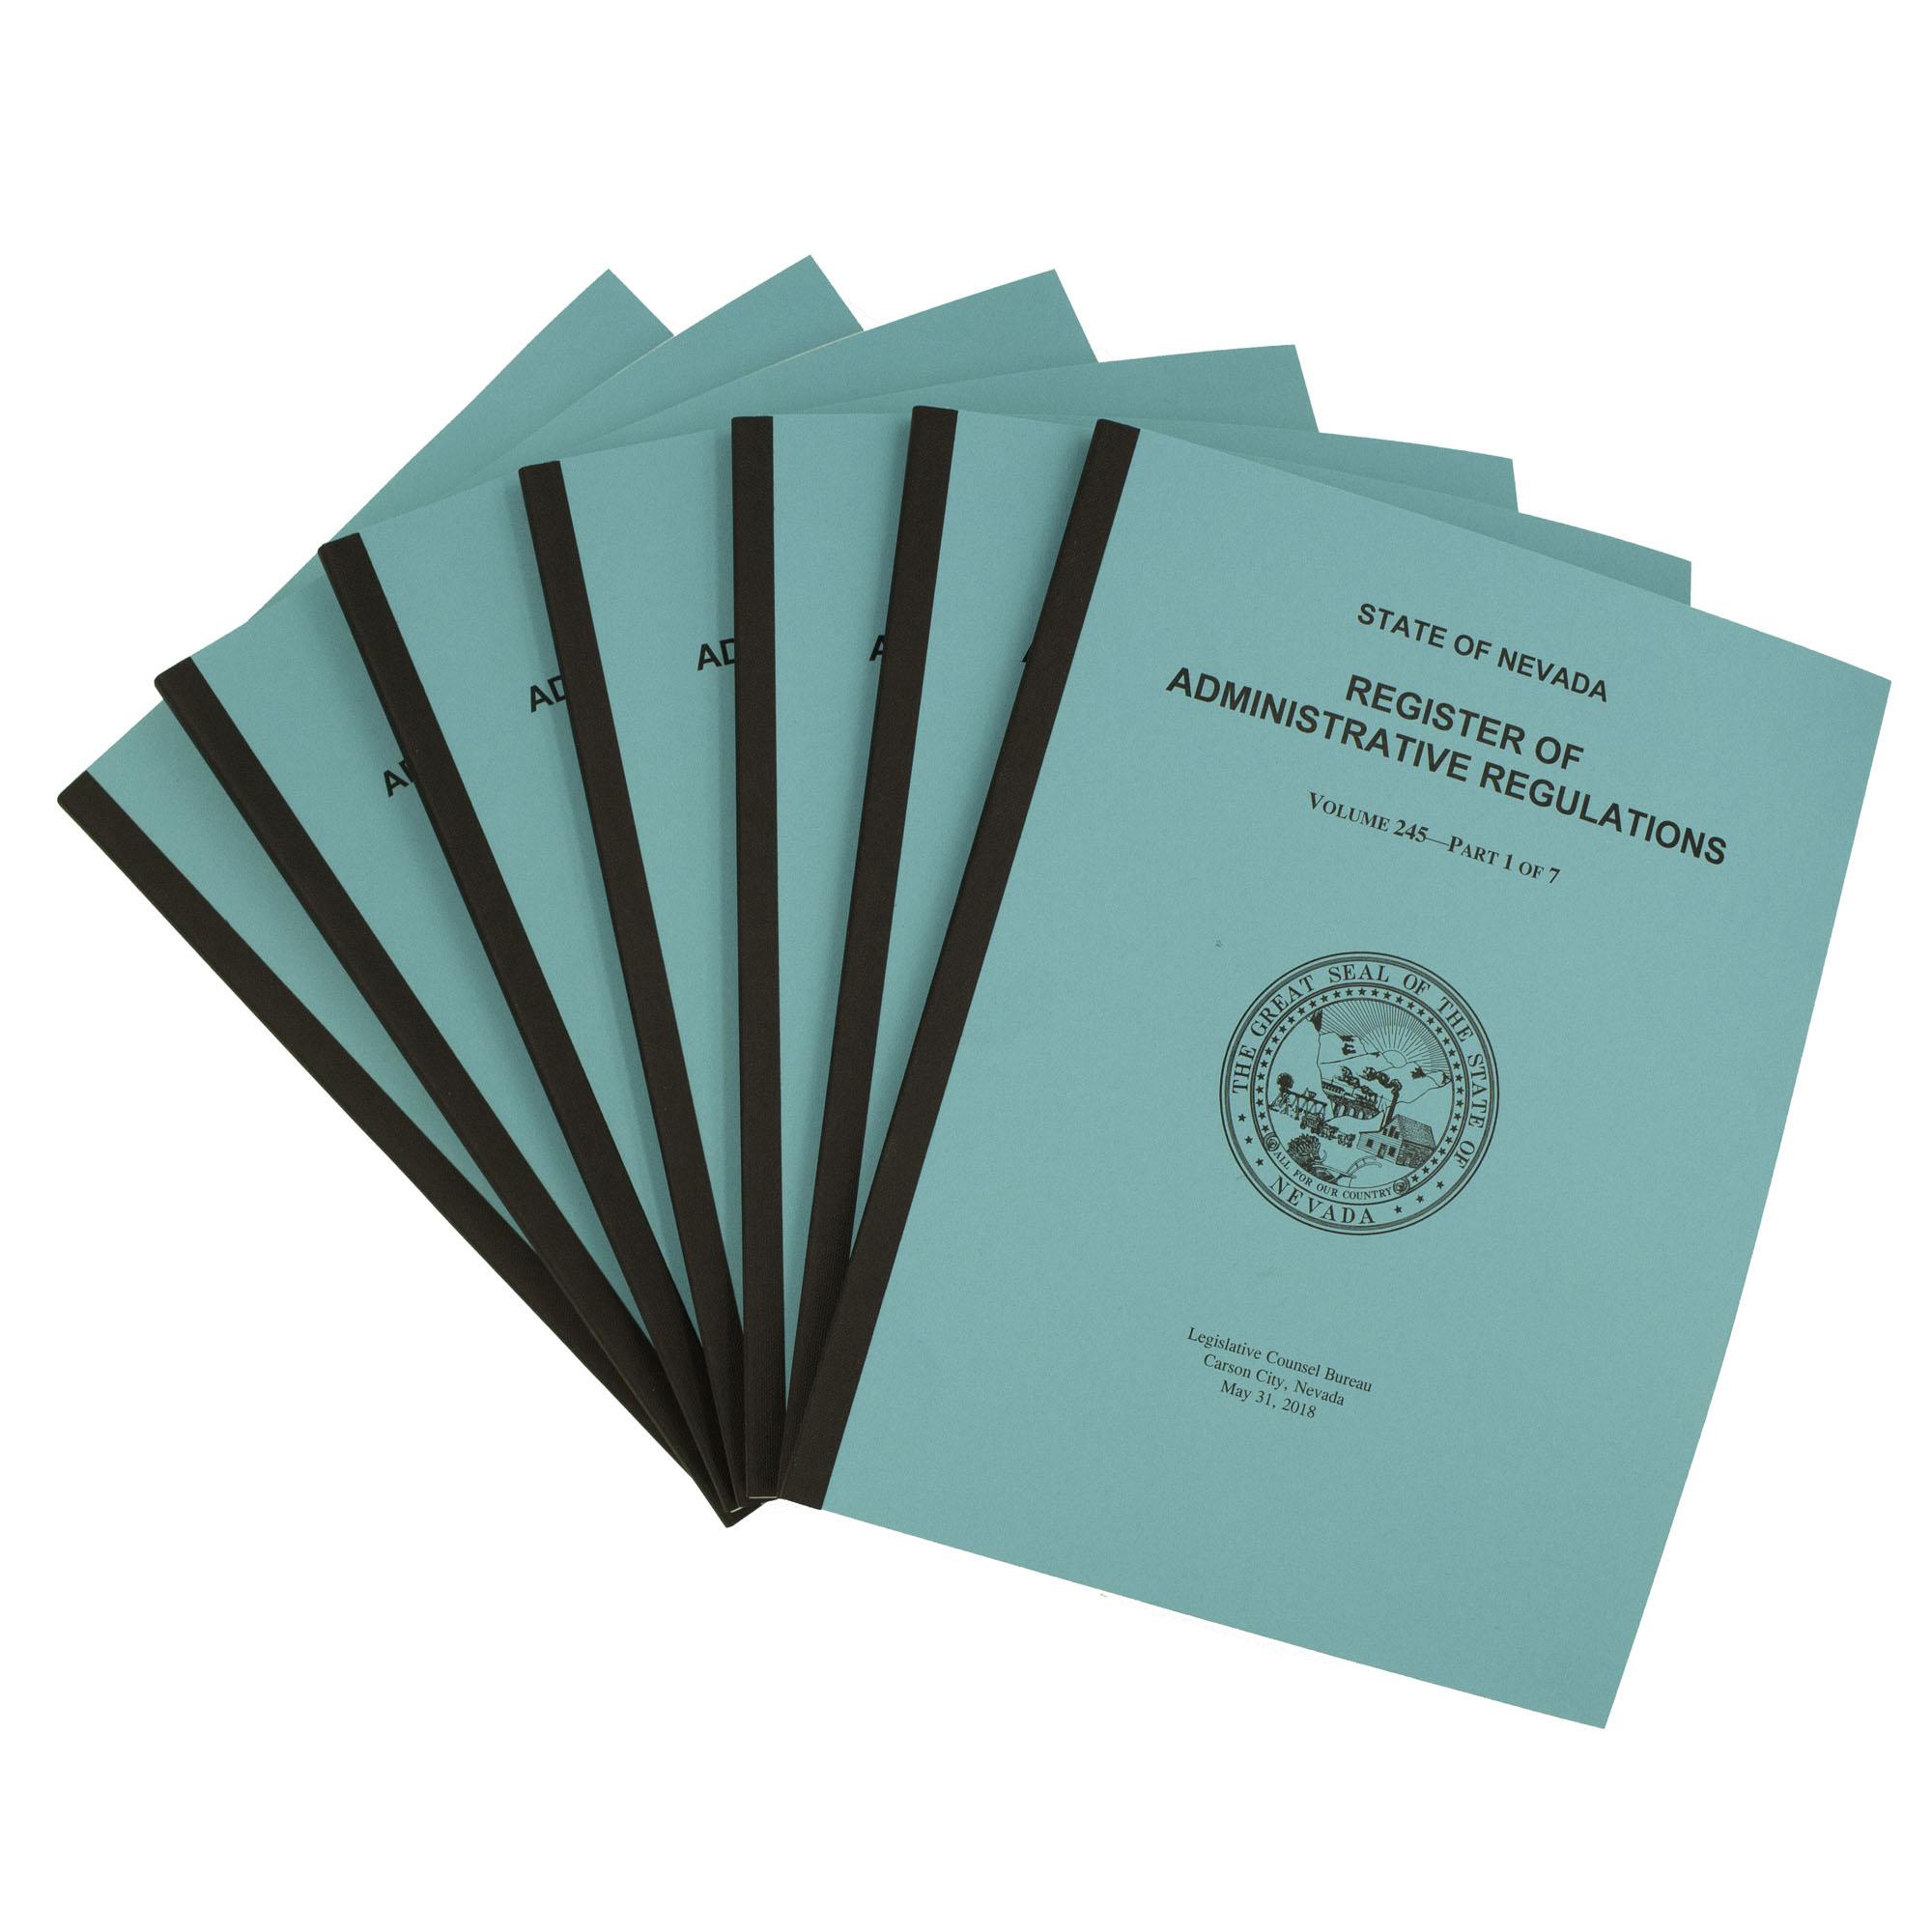 Nevada Administrative Code Register Subscription - July 1, 2019 - June 30,  2020